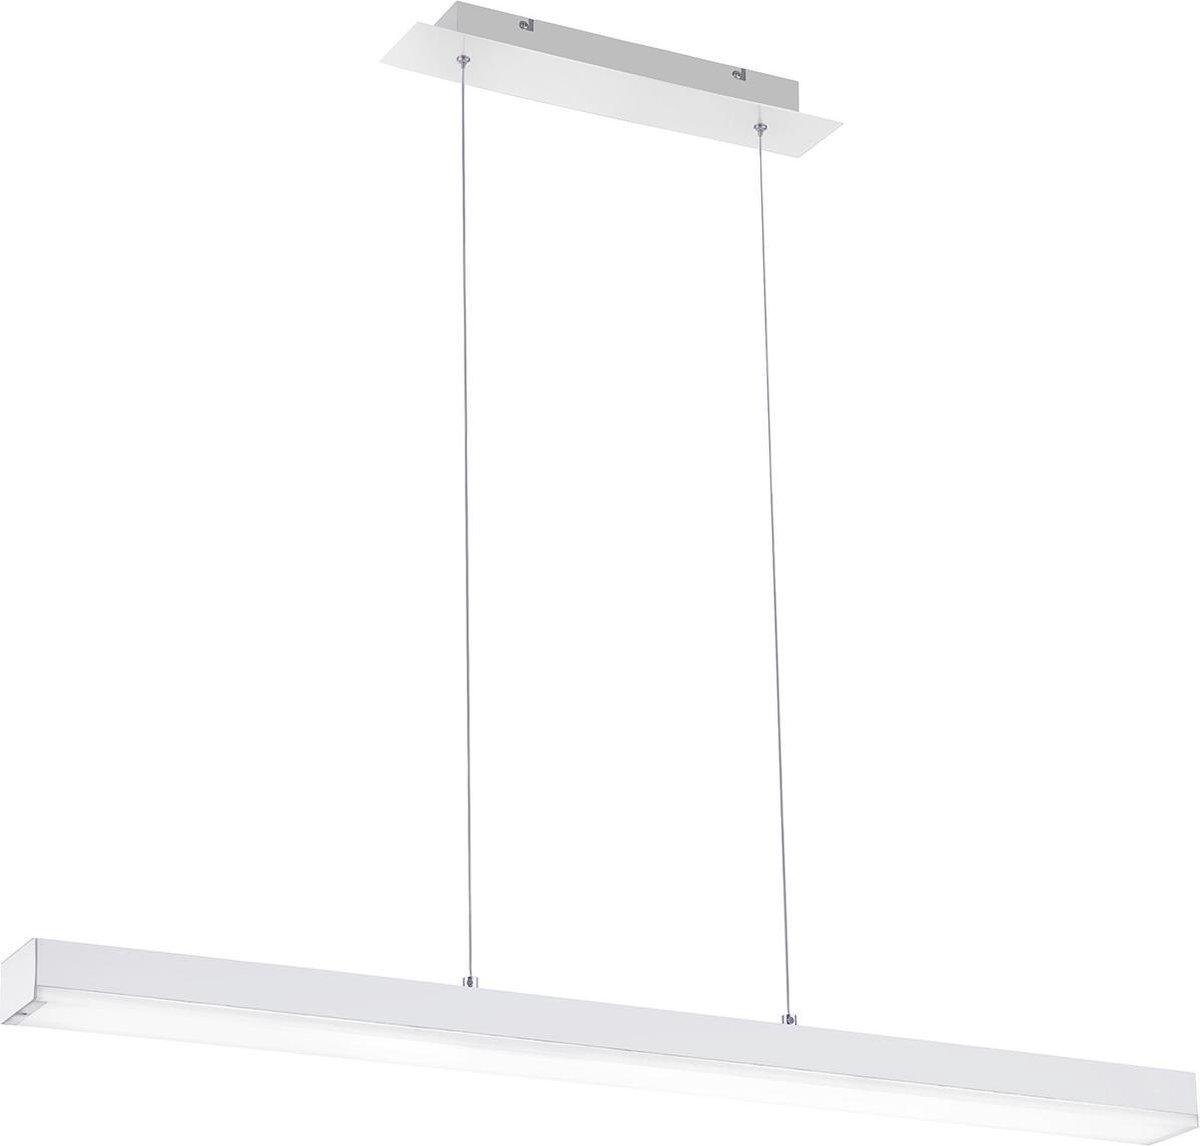 LED Hanglamp WiZ - Smart LED - Hangverlichting - Trion Lavar - 20W - Aanpasbare Kleur - RGBW - Rechthoek - Mat Wit - Aluminium - BSE